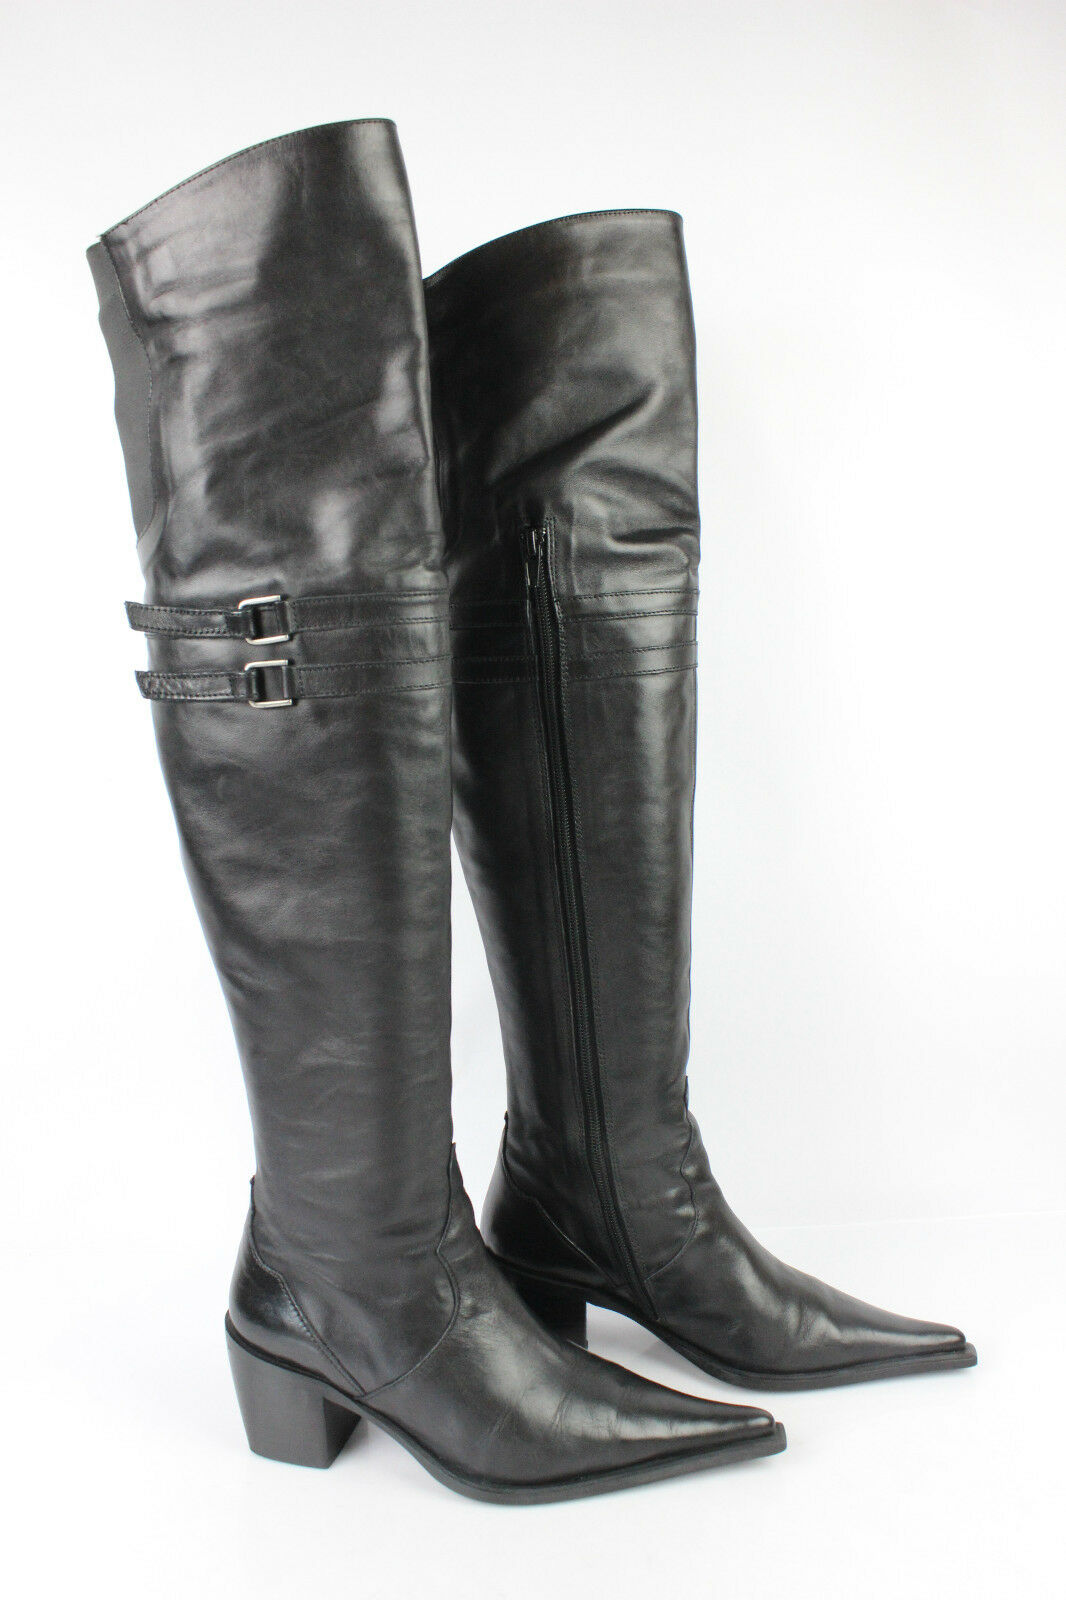 Bottes genoux cuissardes semog cuir noir t 36 tbe